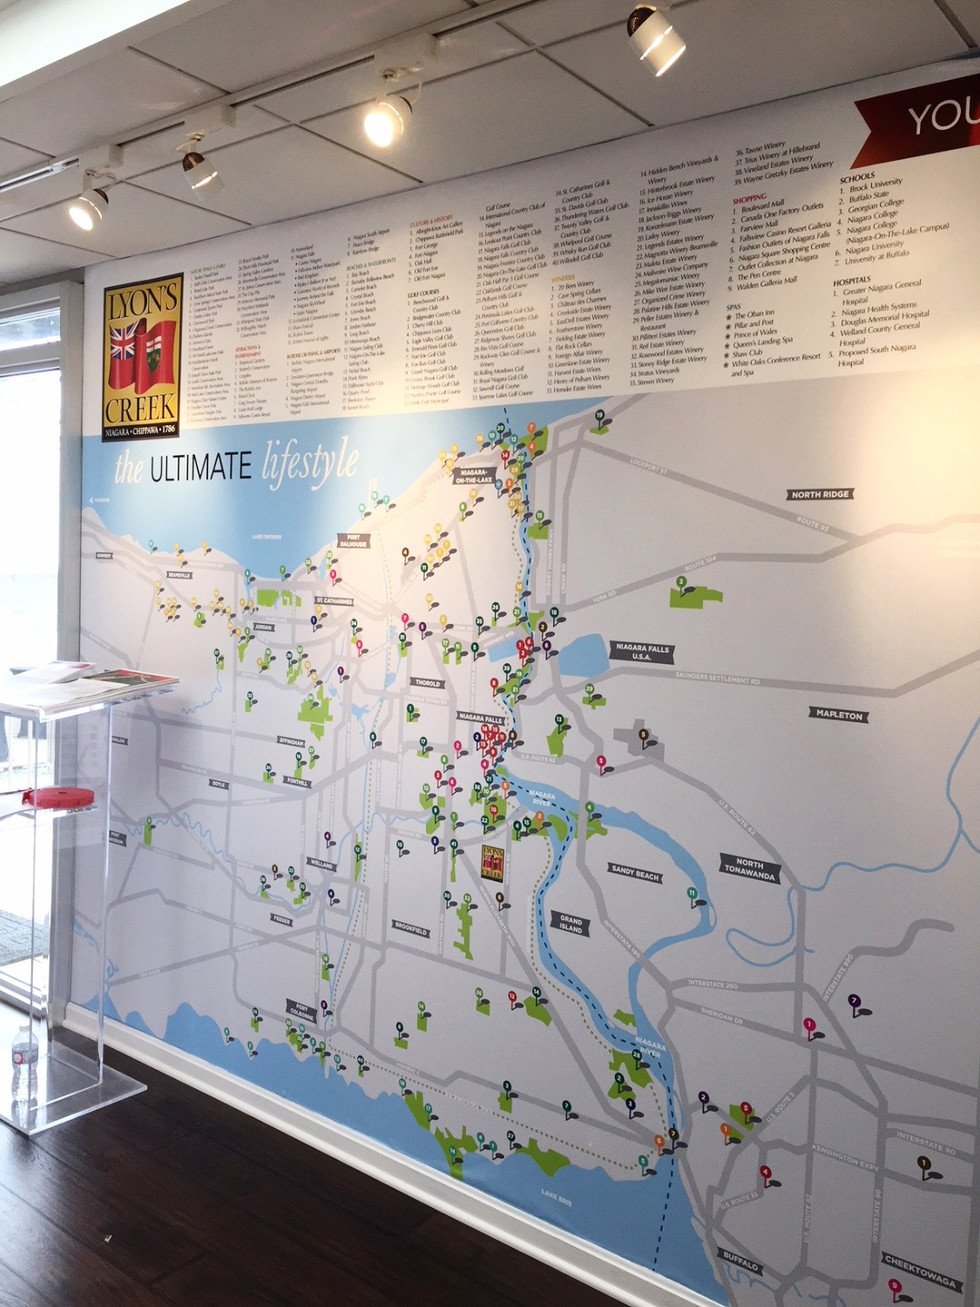 Lyon's Creek Amenity Map in Presentation Centre